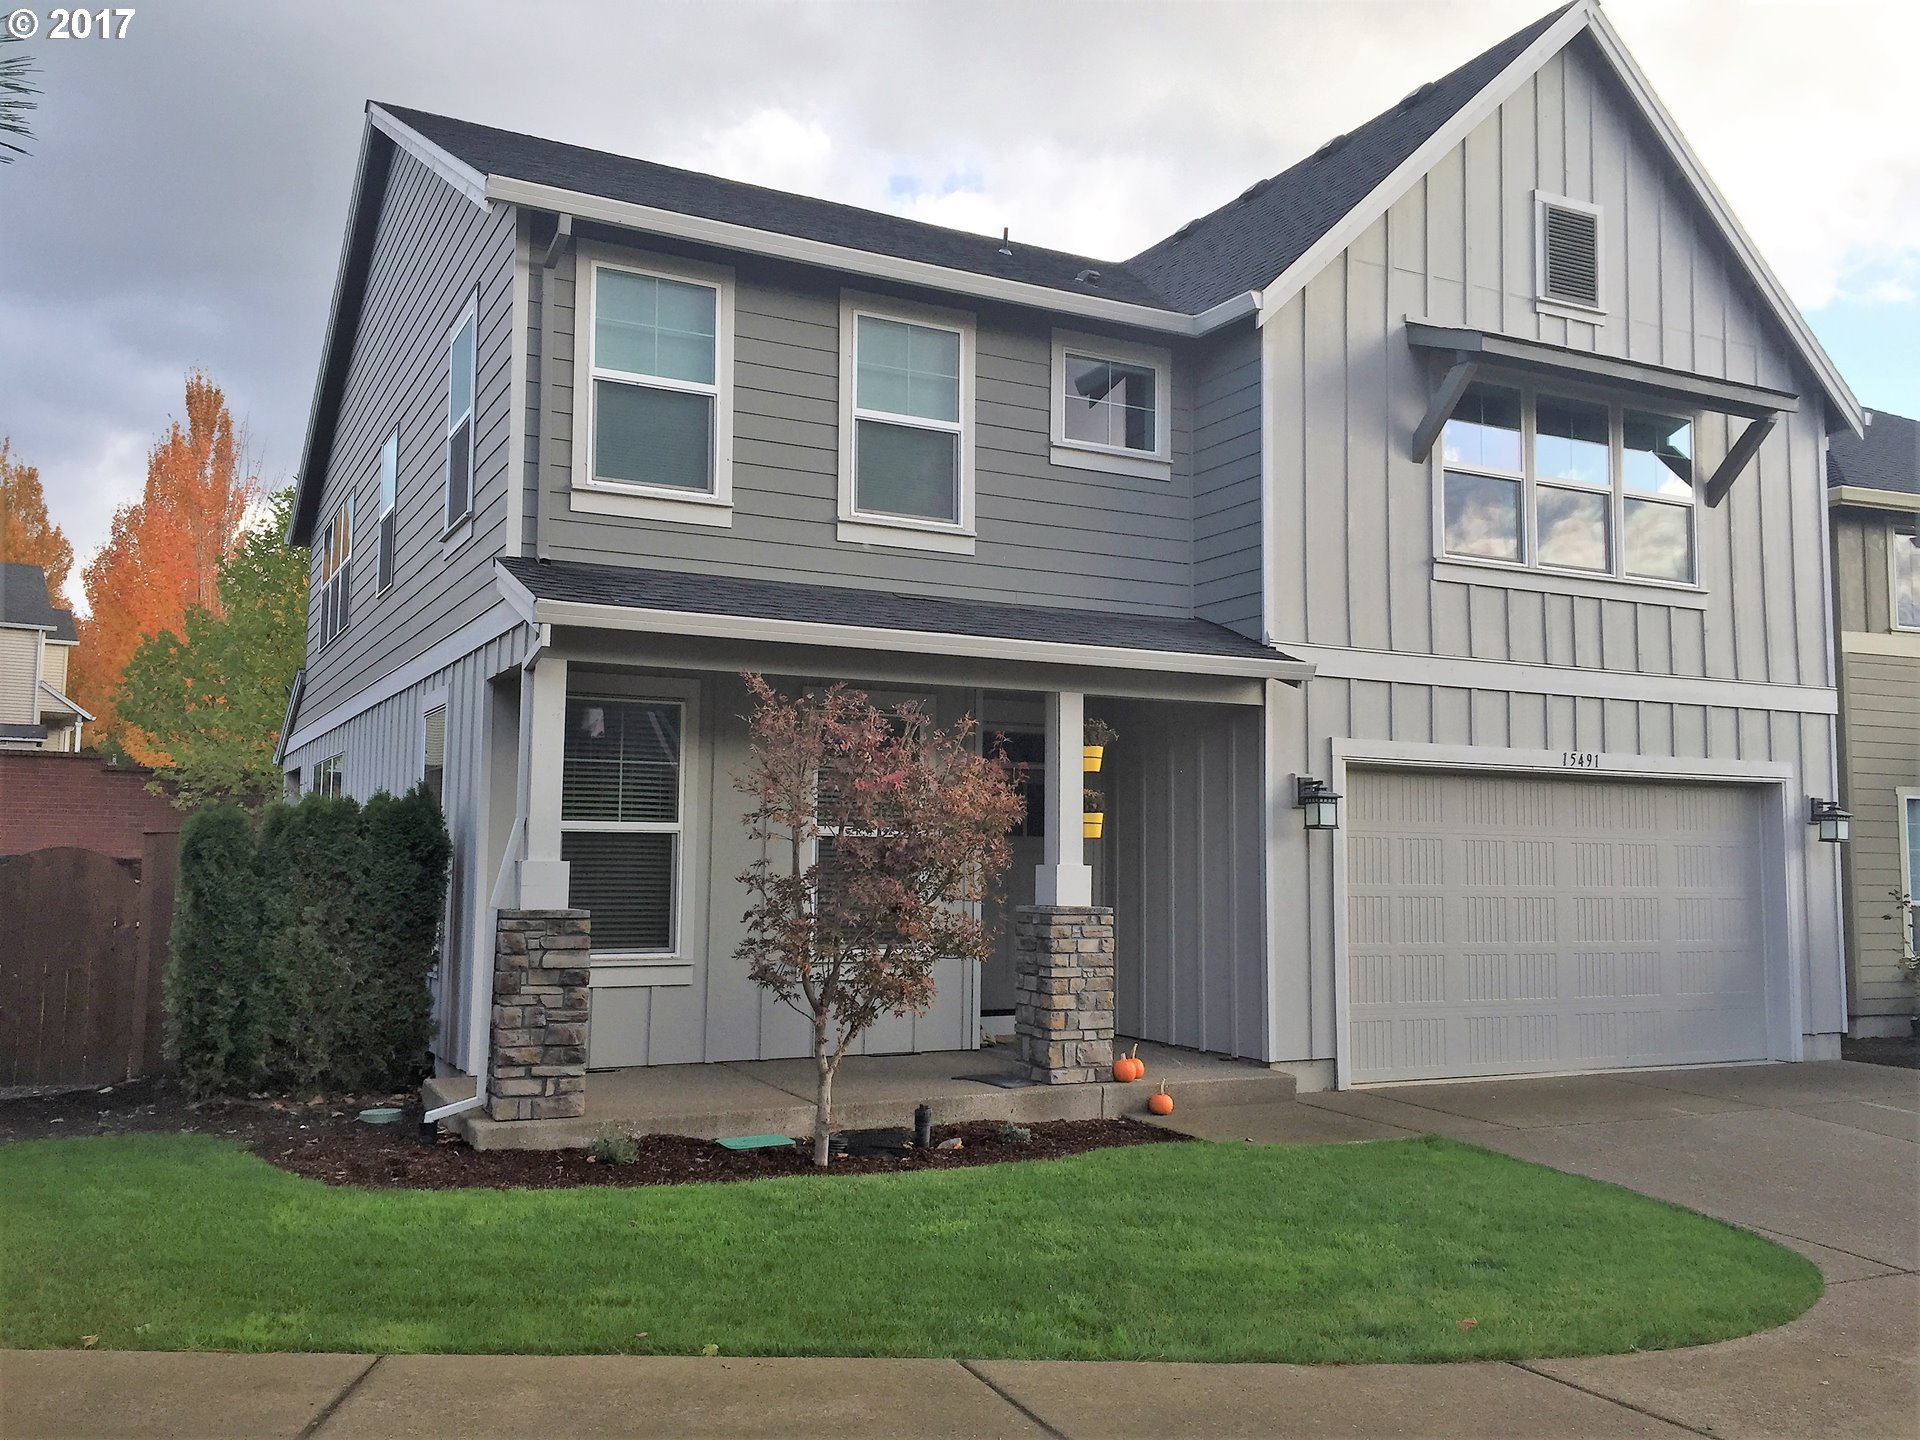 15491 NW RYEGRASS ST Portland, OR 97229 - MLS #: 17513653